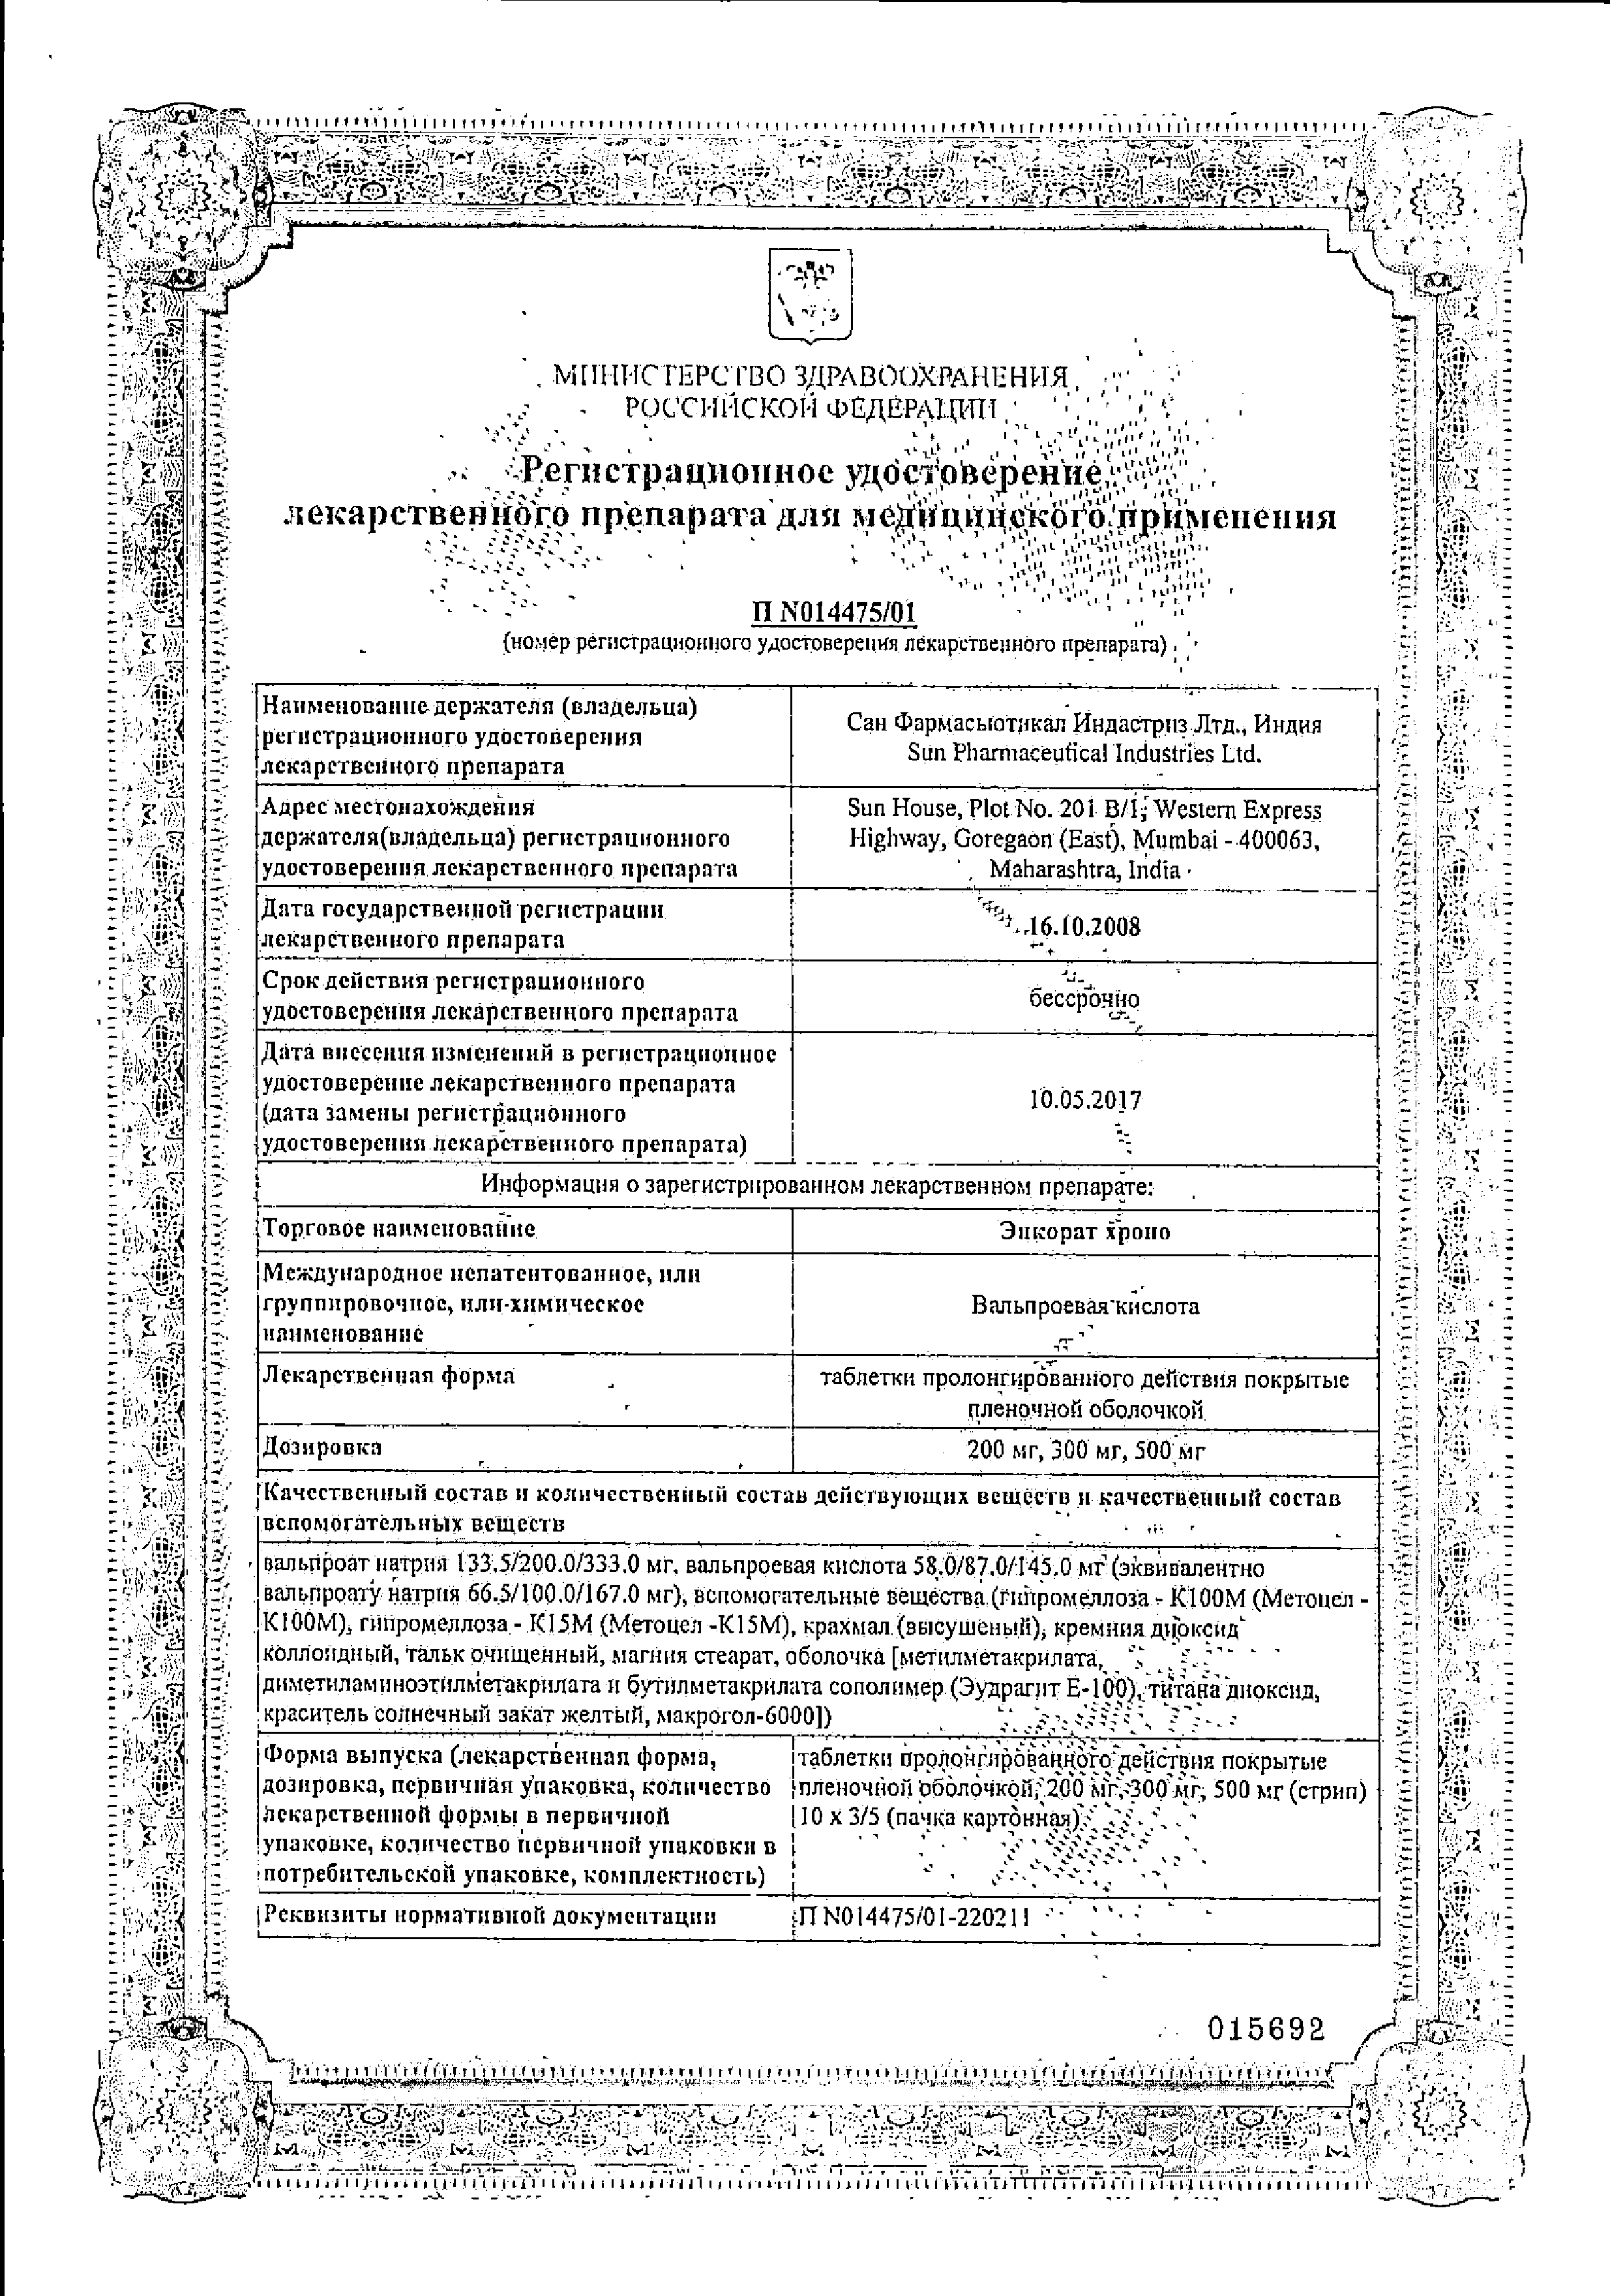 Энкорат хроно сертификат